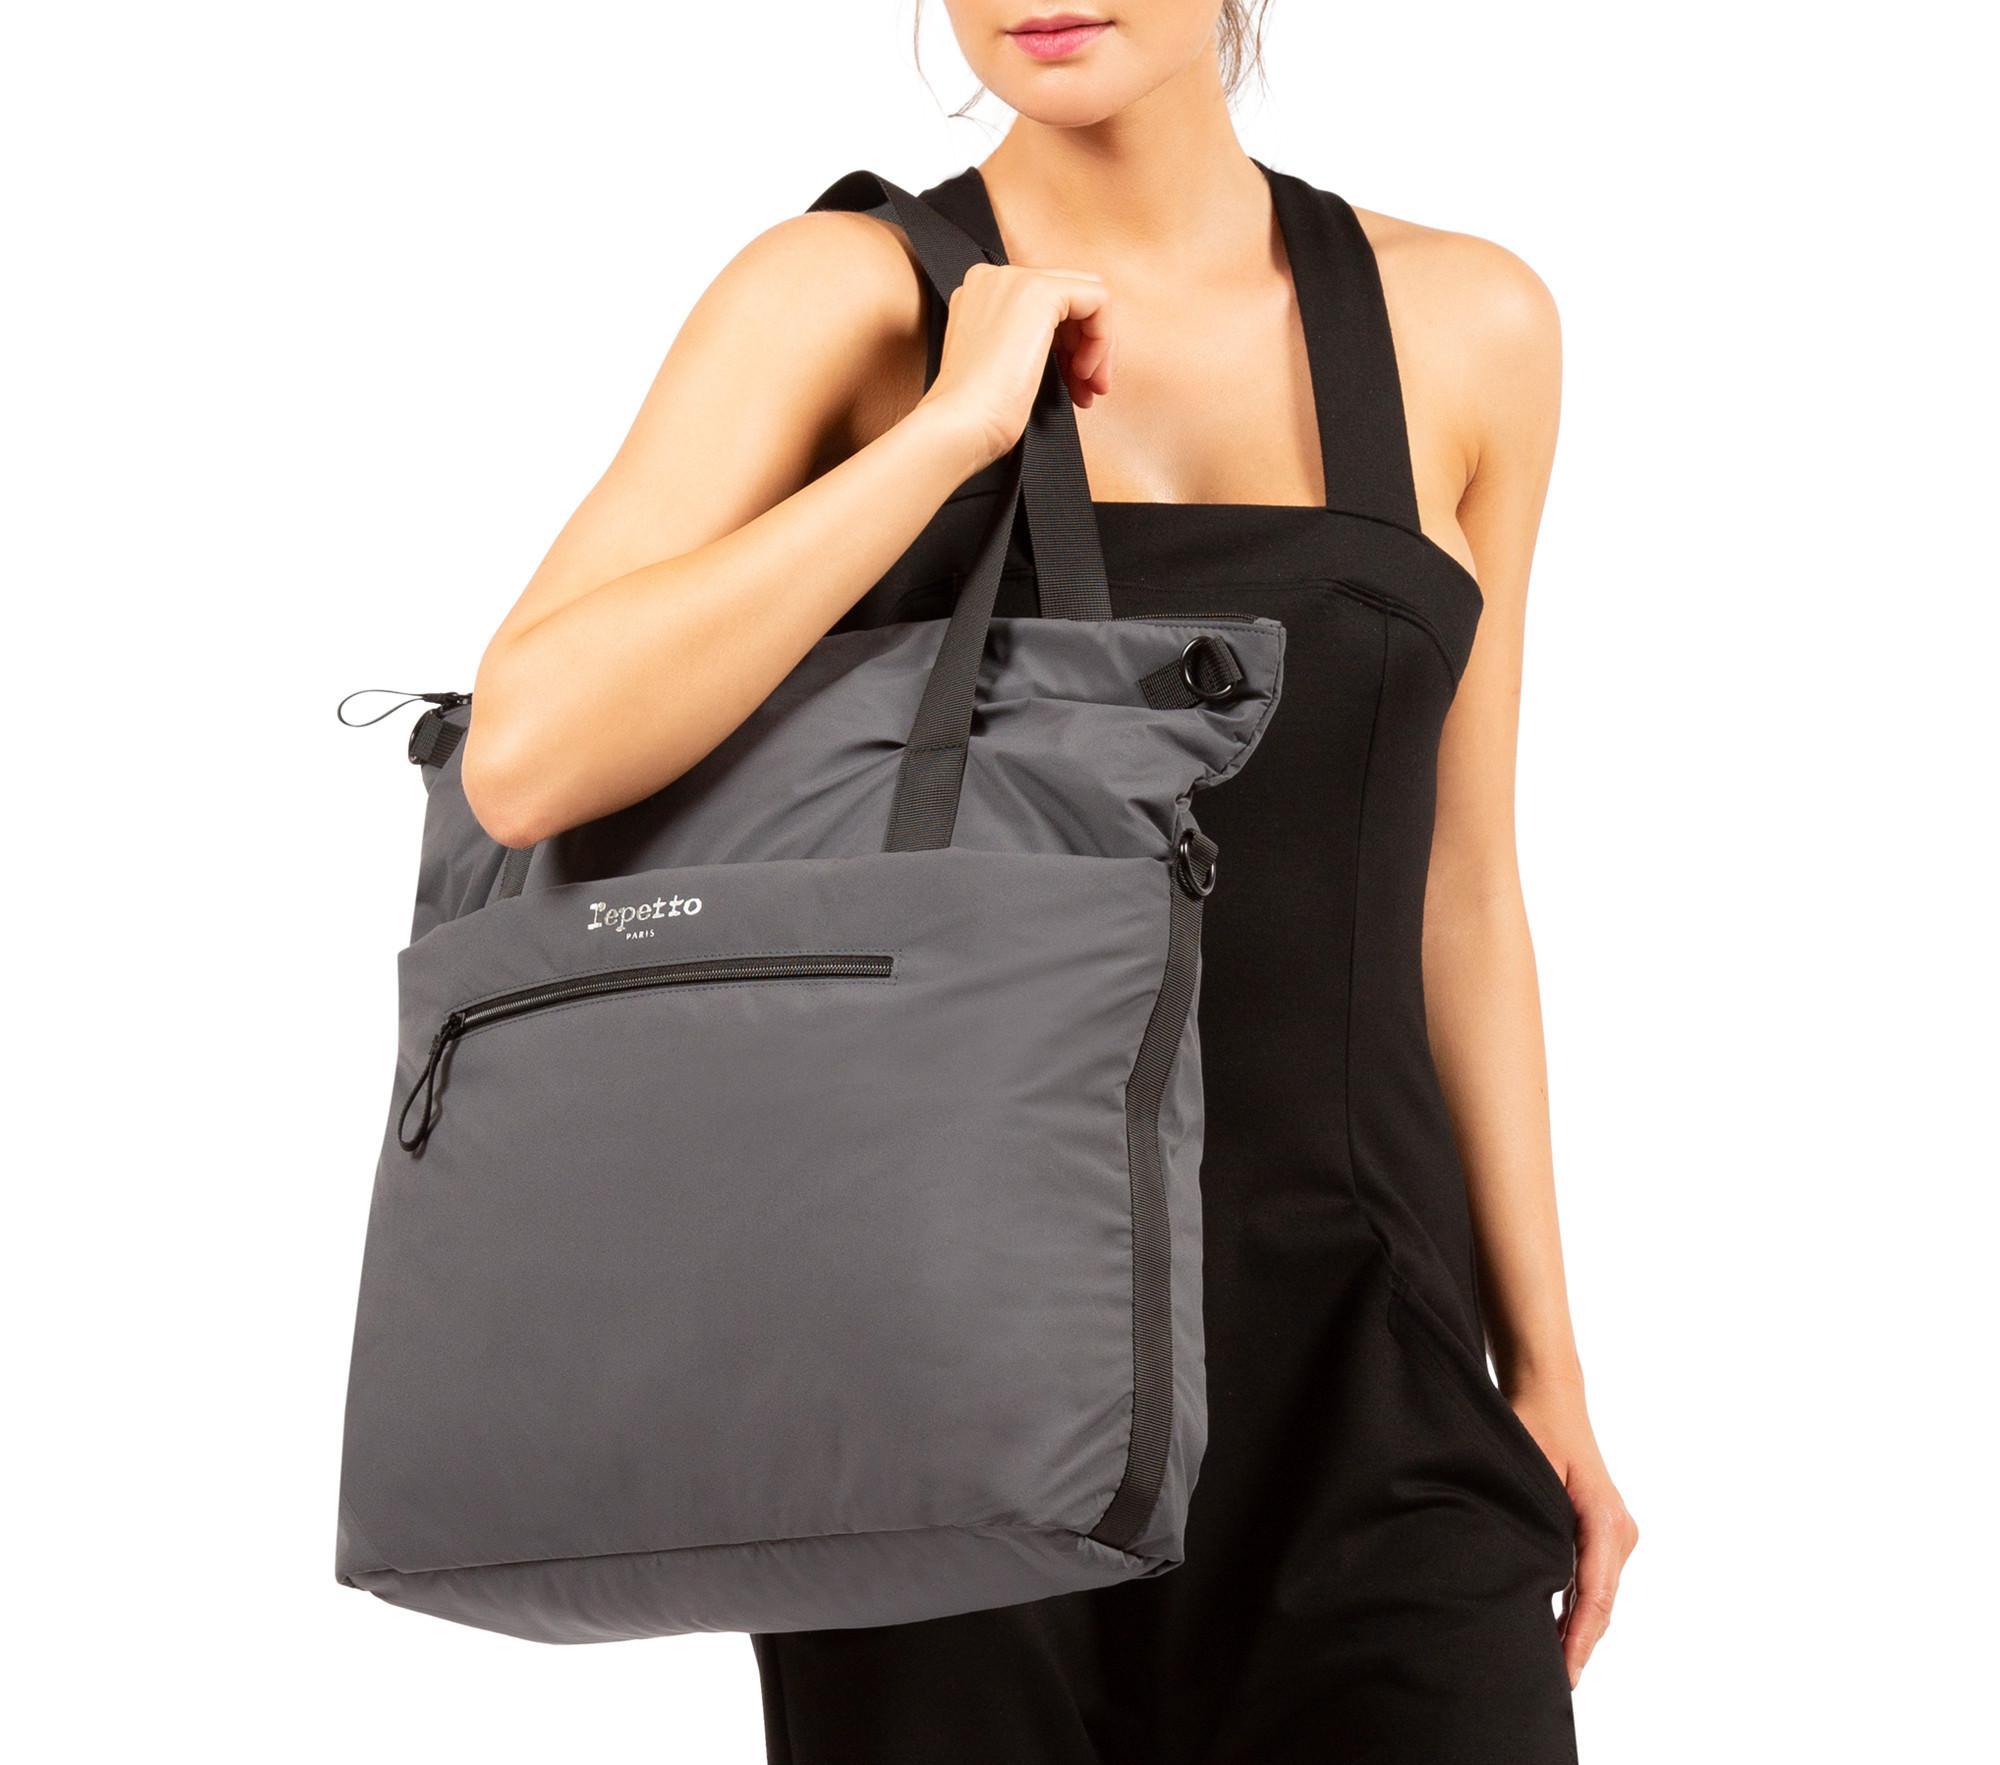 Agon several carrying bag